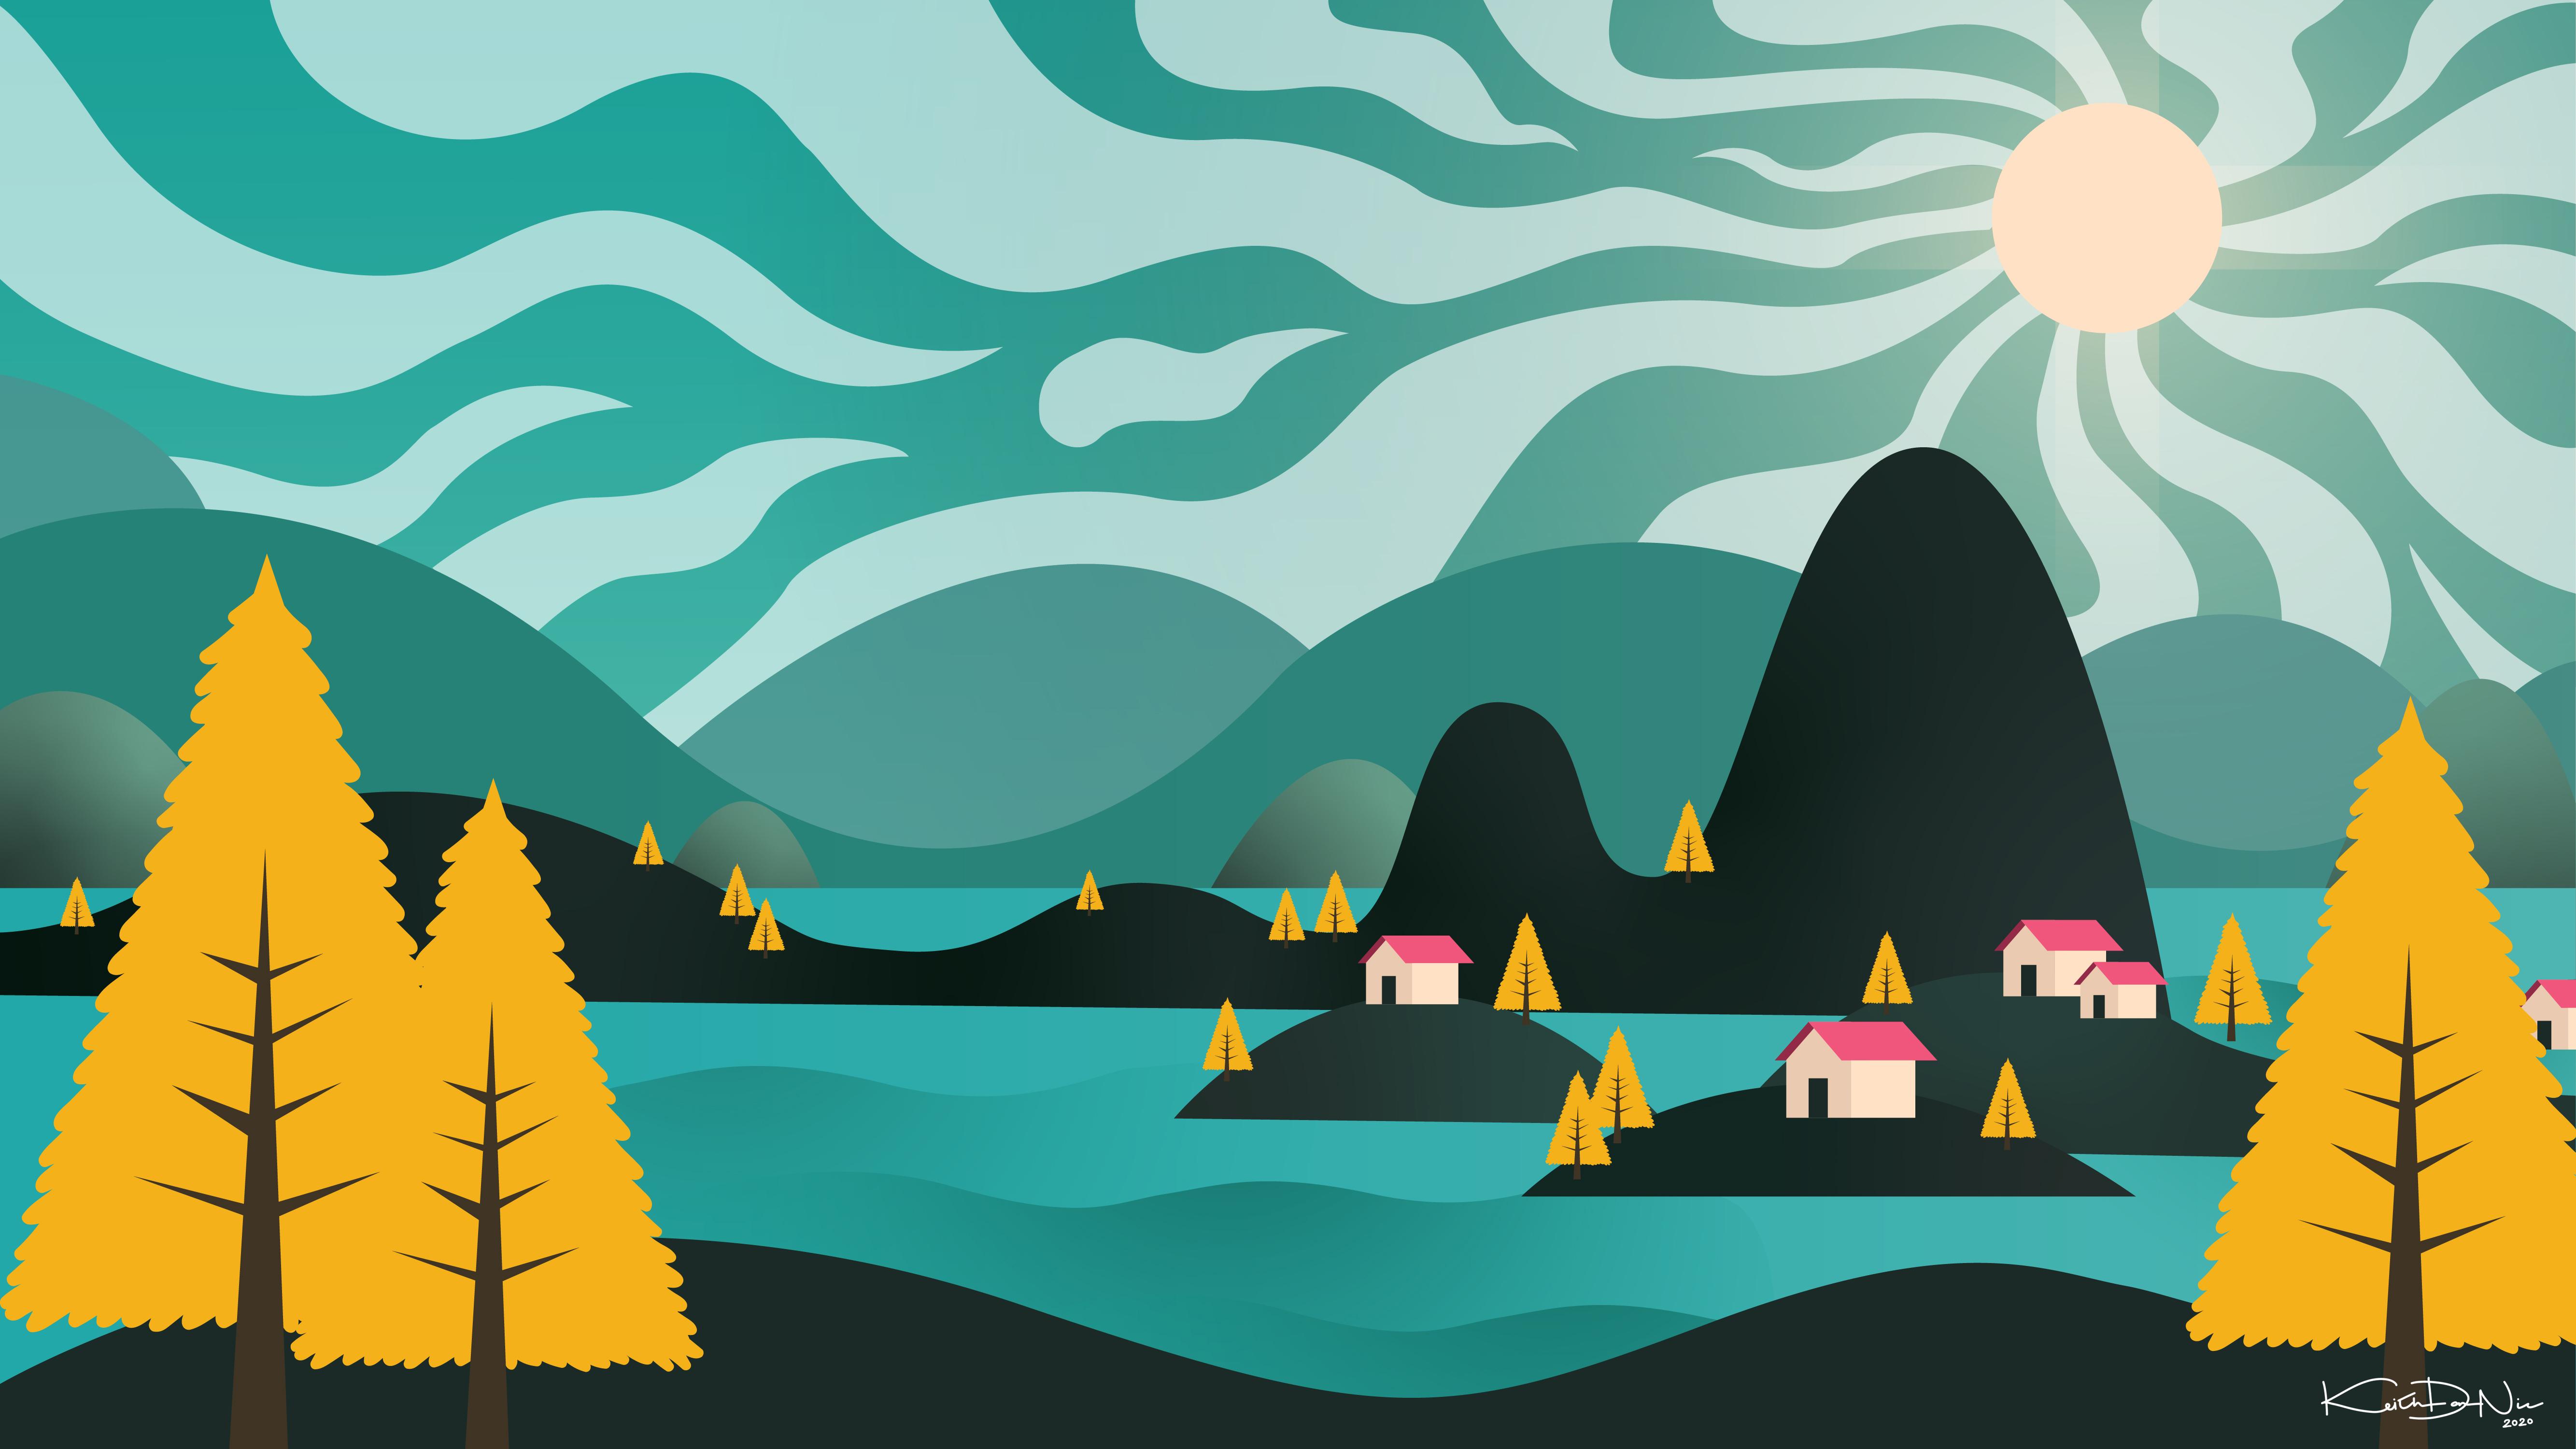 09142020 - Background Illustration